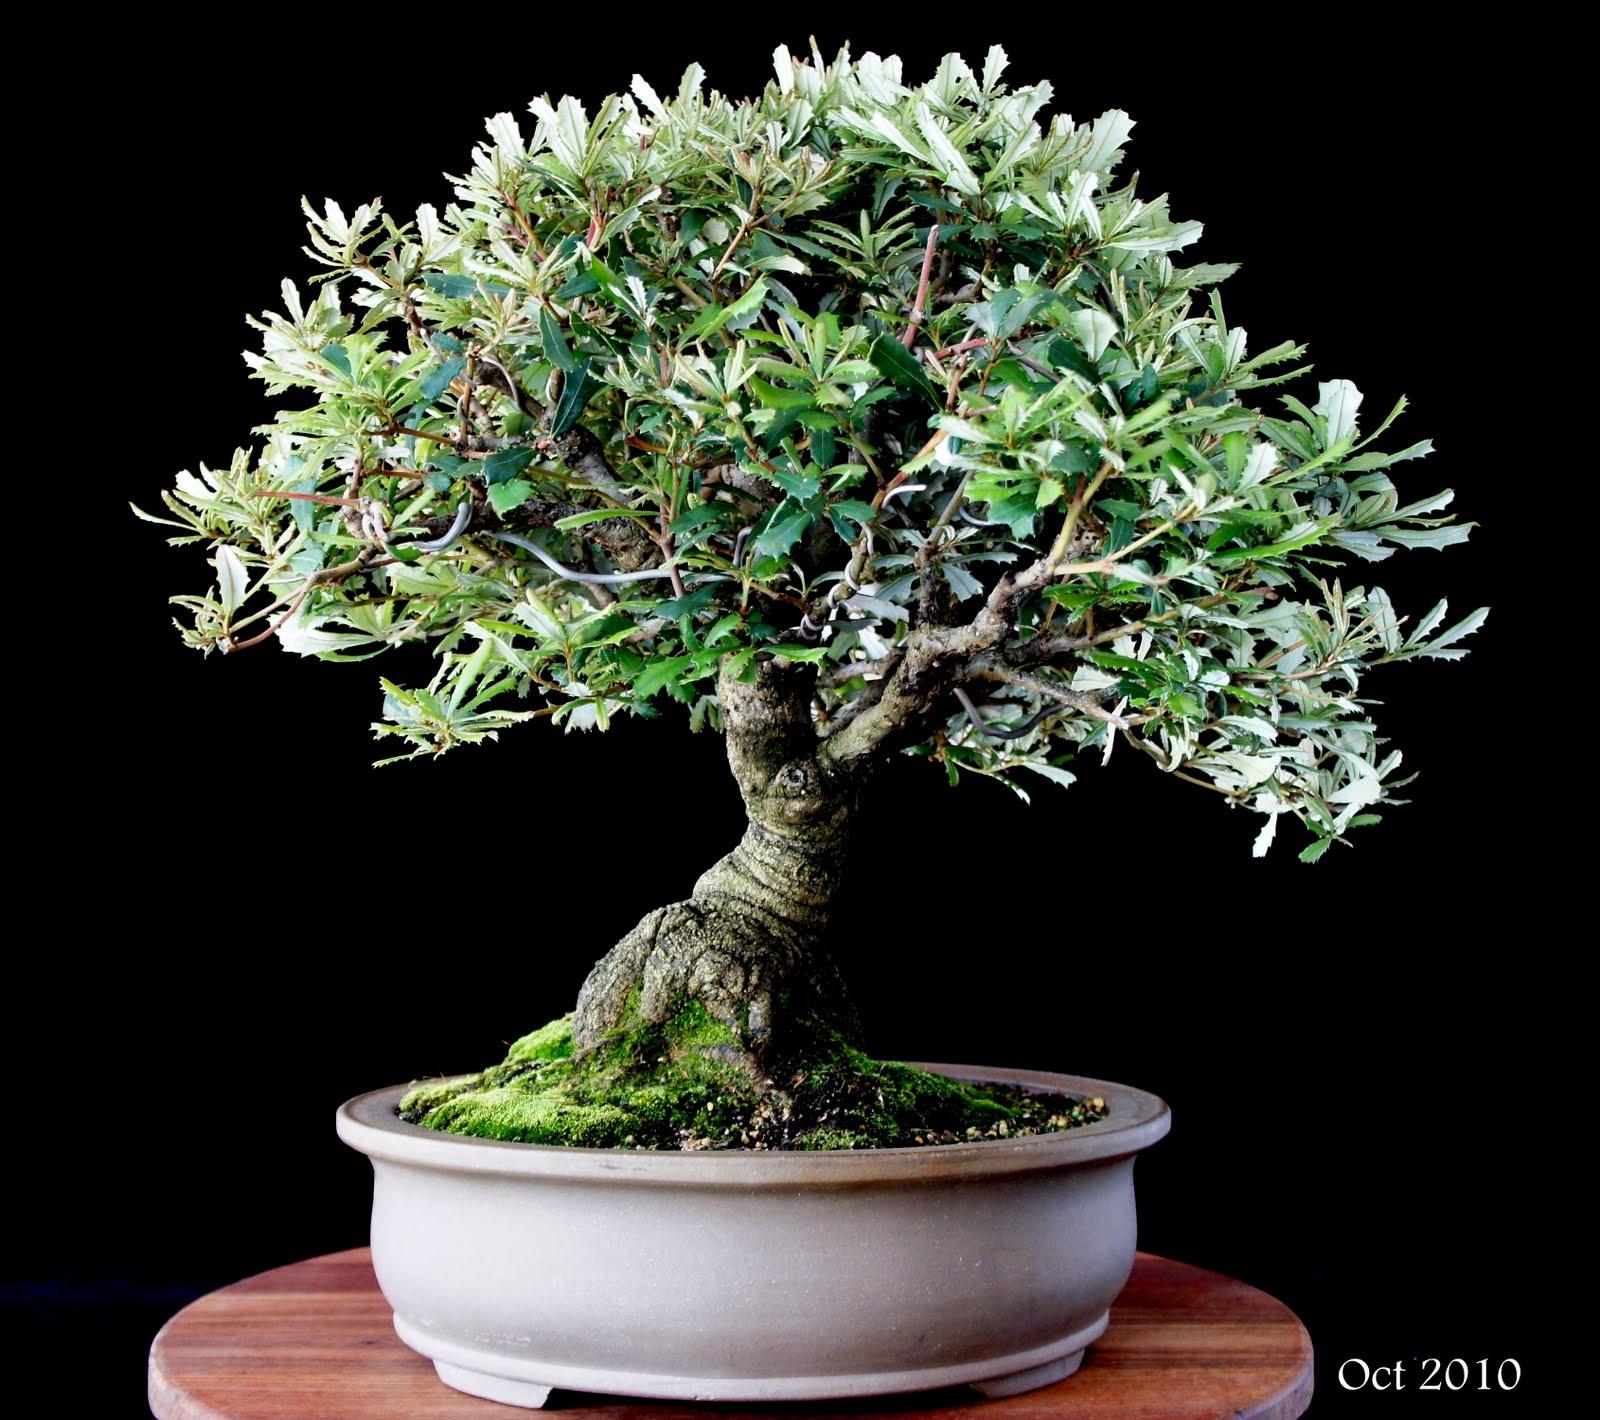 Newzealandteatreebonsai A Banksia Bonsai